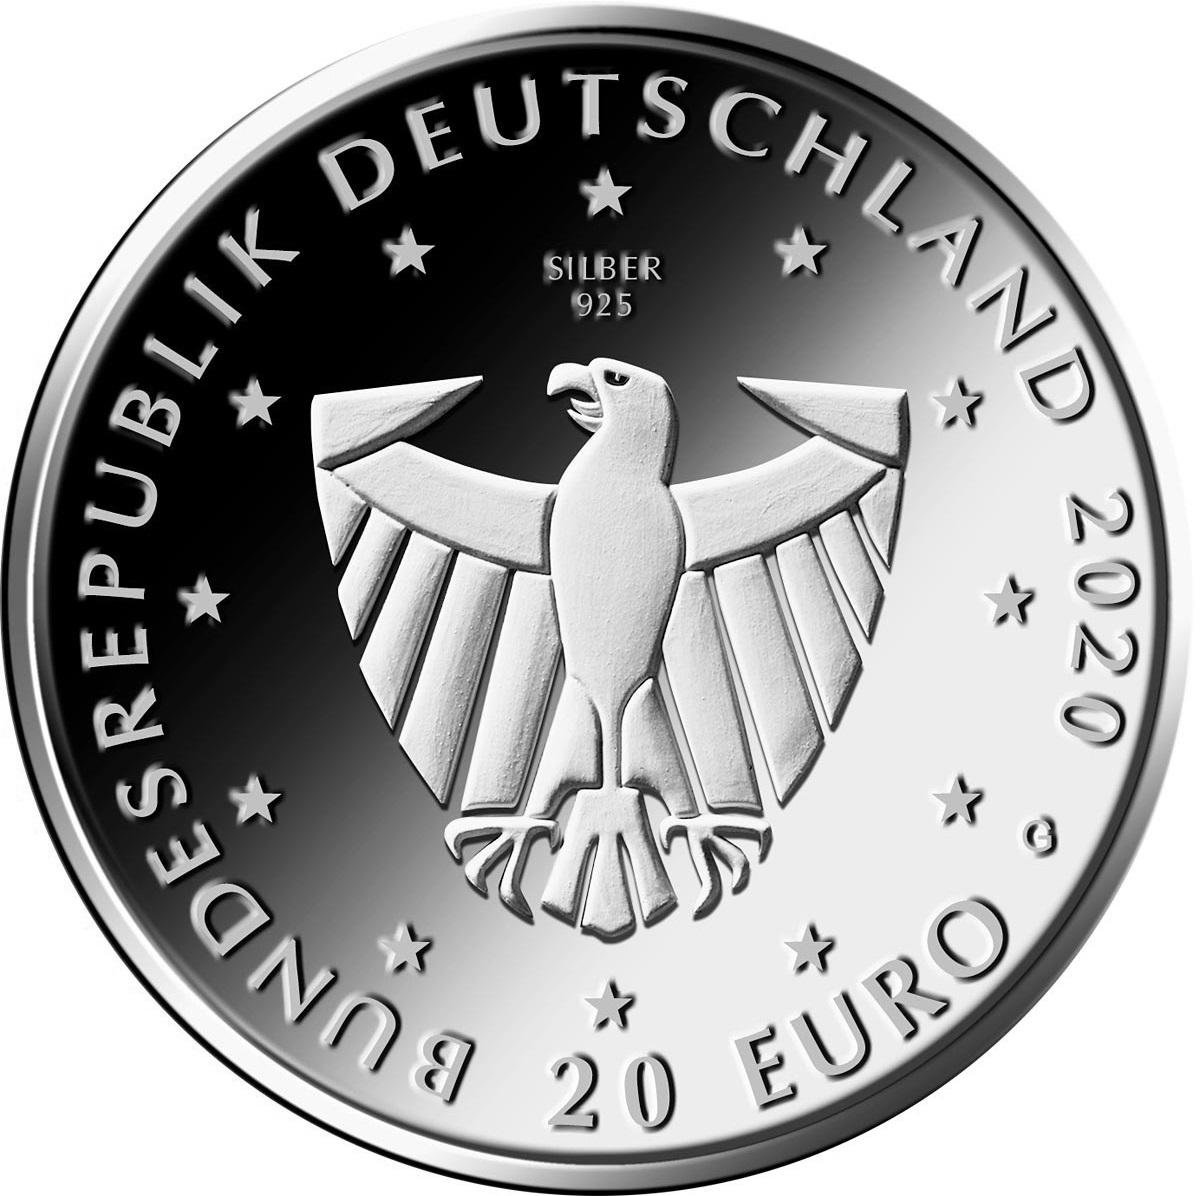 Германия монета 20 евро 900 лет со дня основания Фрайбурга, аверс